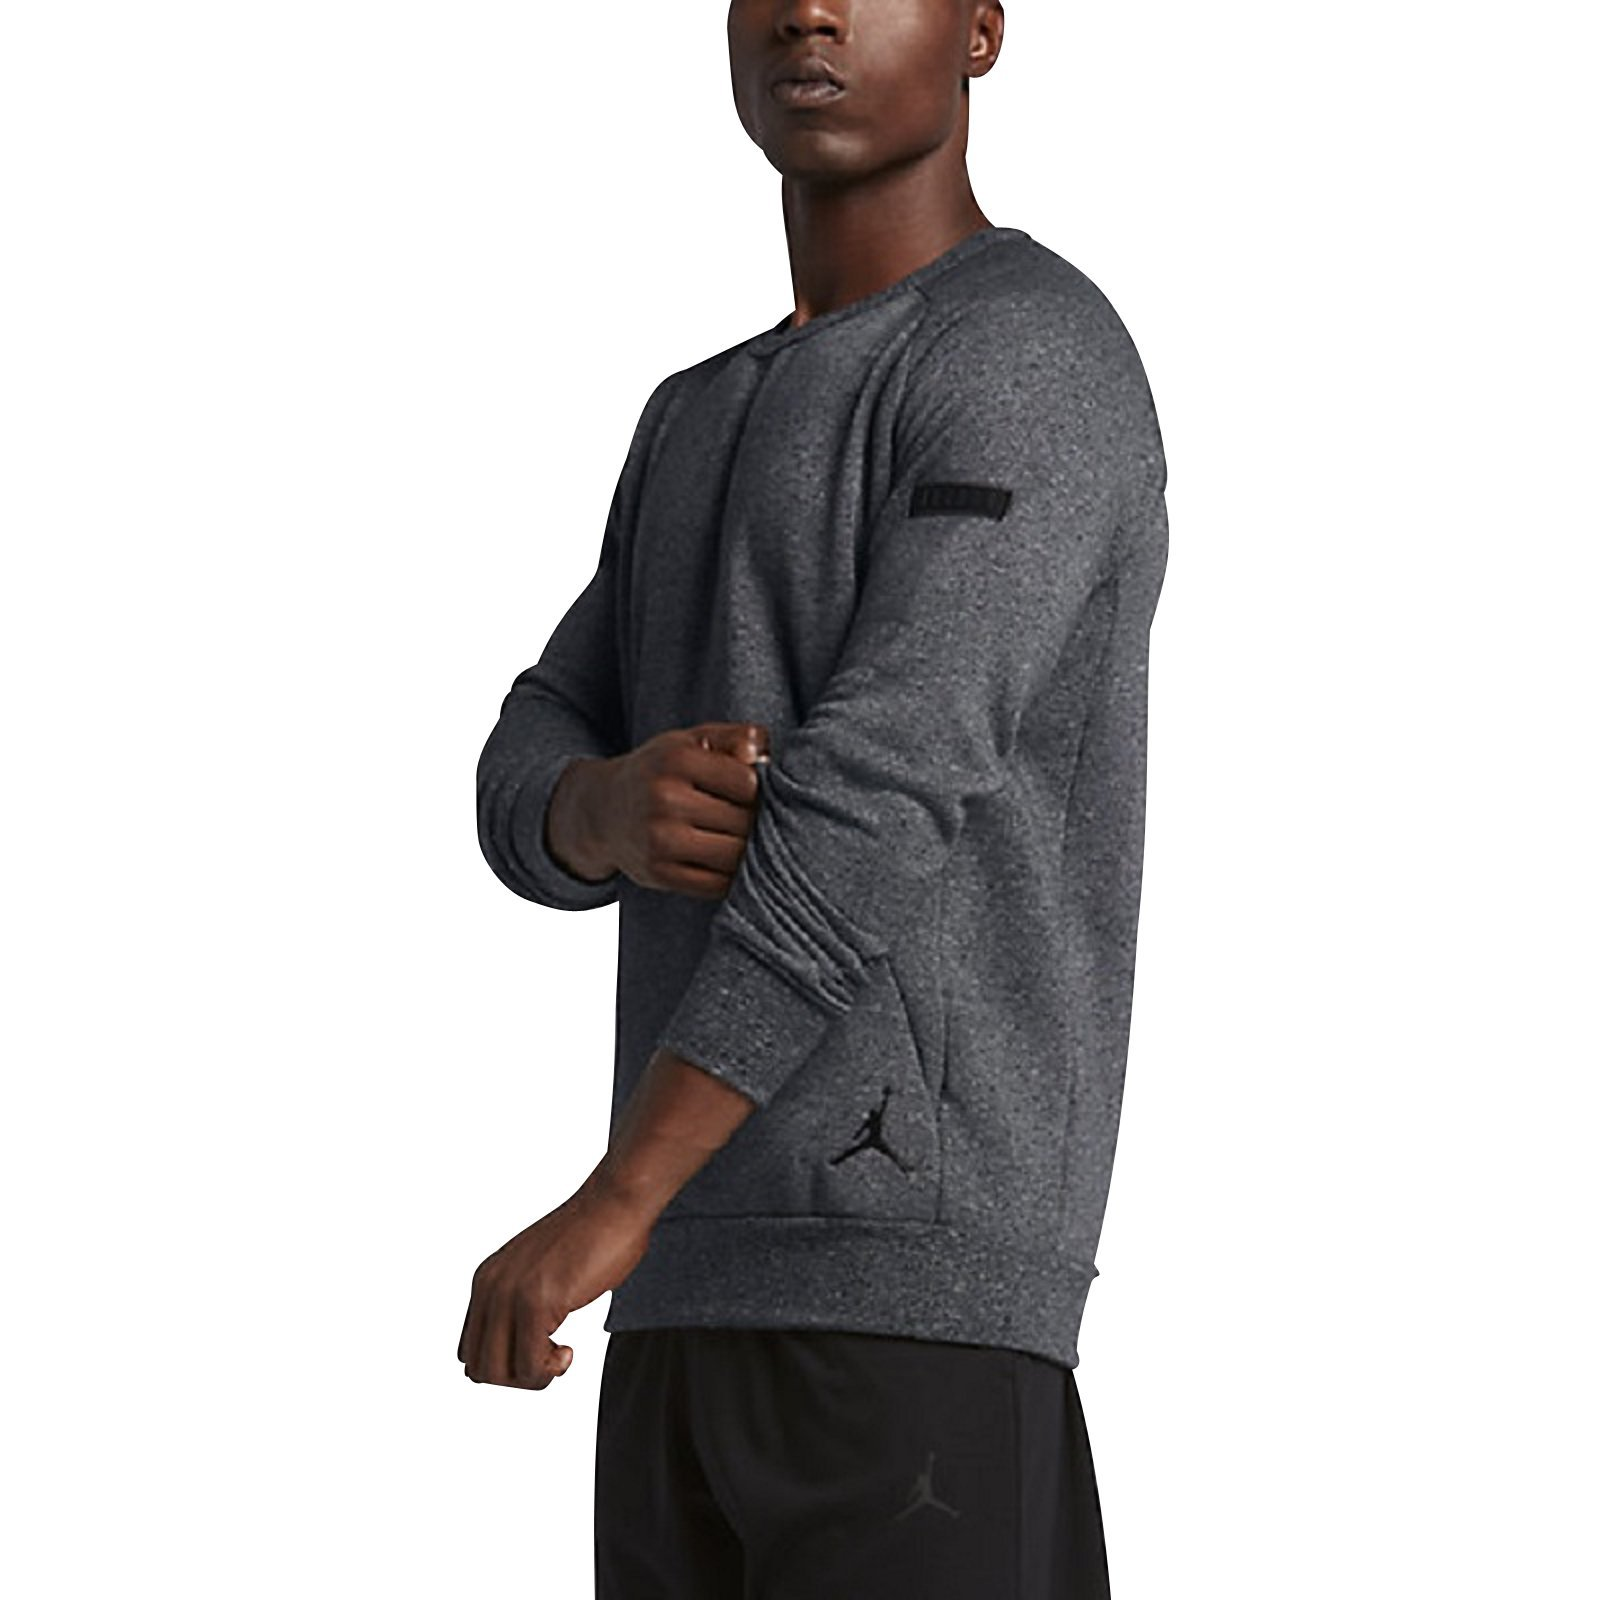 Jordan Icon Fleece Crew Neck Men's Fashion Casual Winter Sweatshirt Black 802181-010 (Size XL)